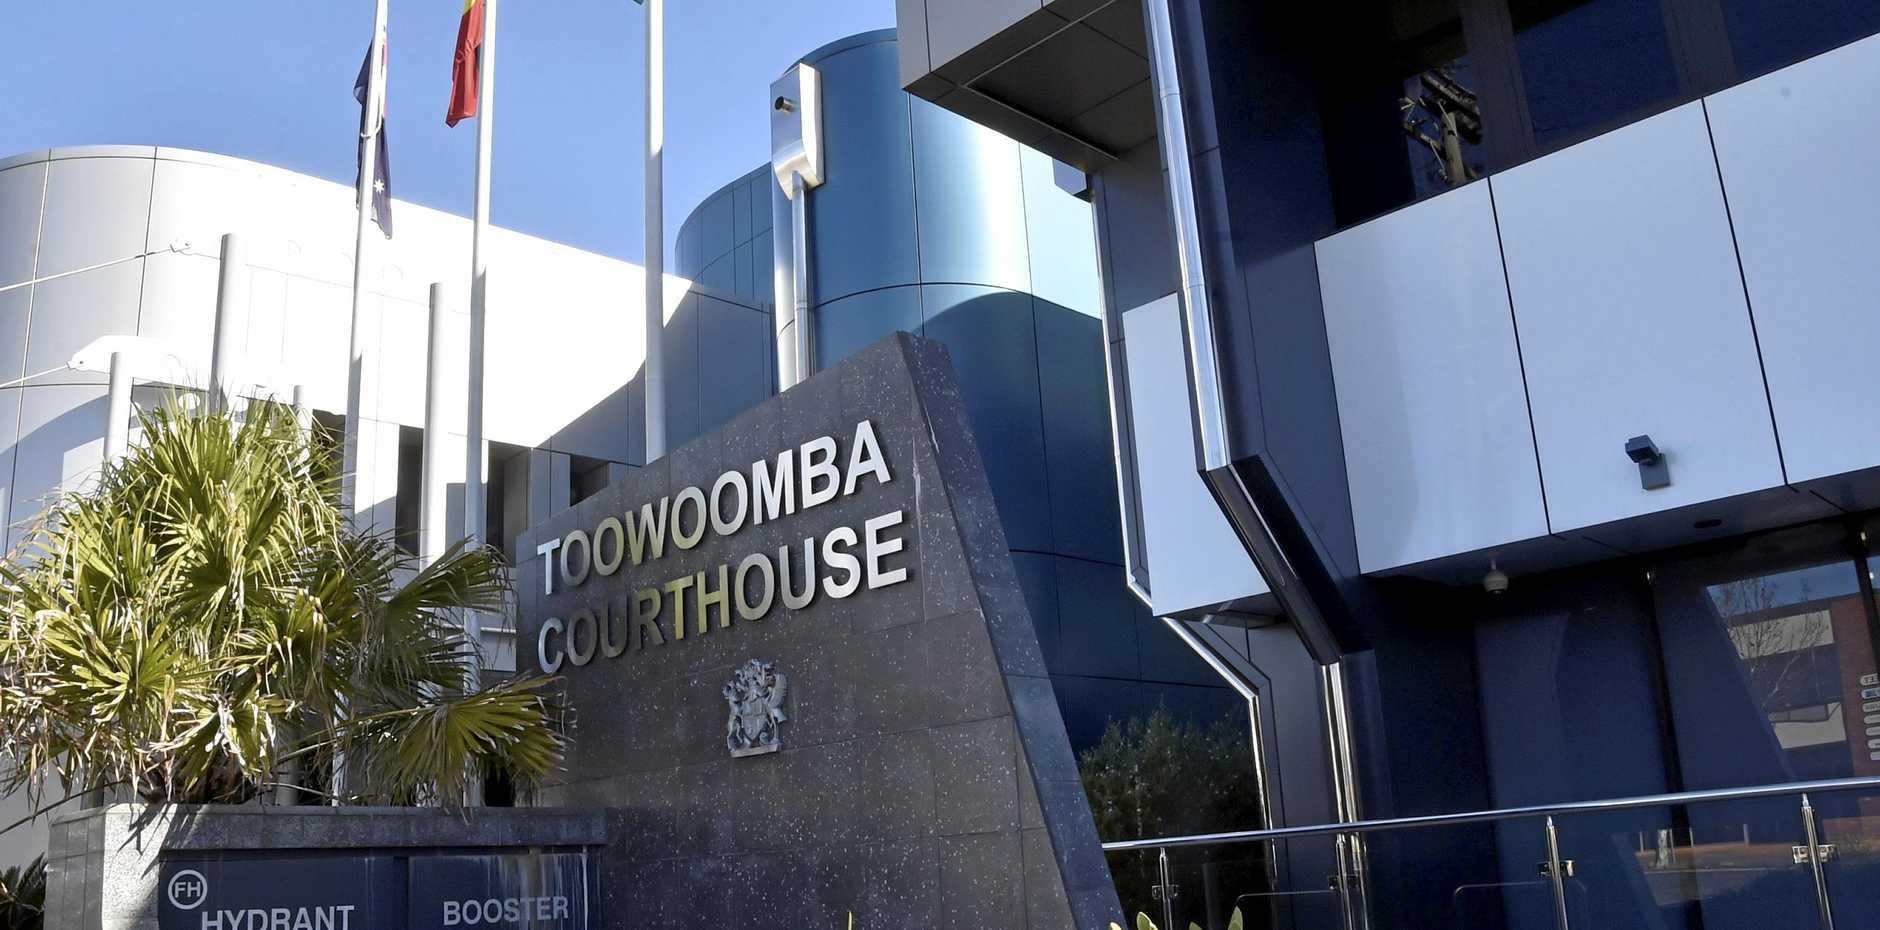 Toowoomba courthouse. Police Station . July 2018